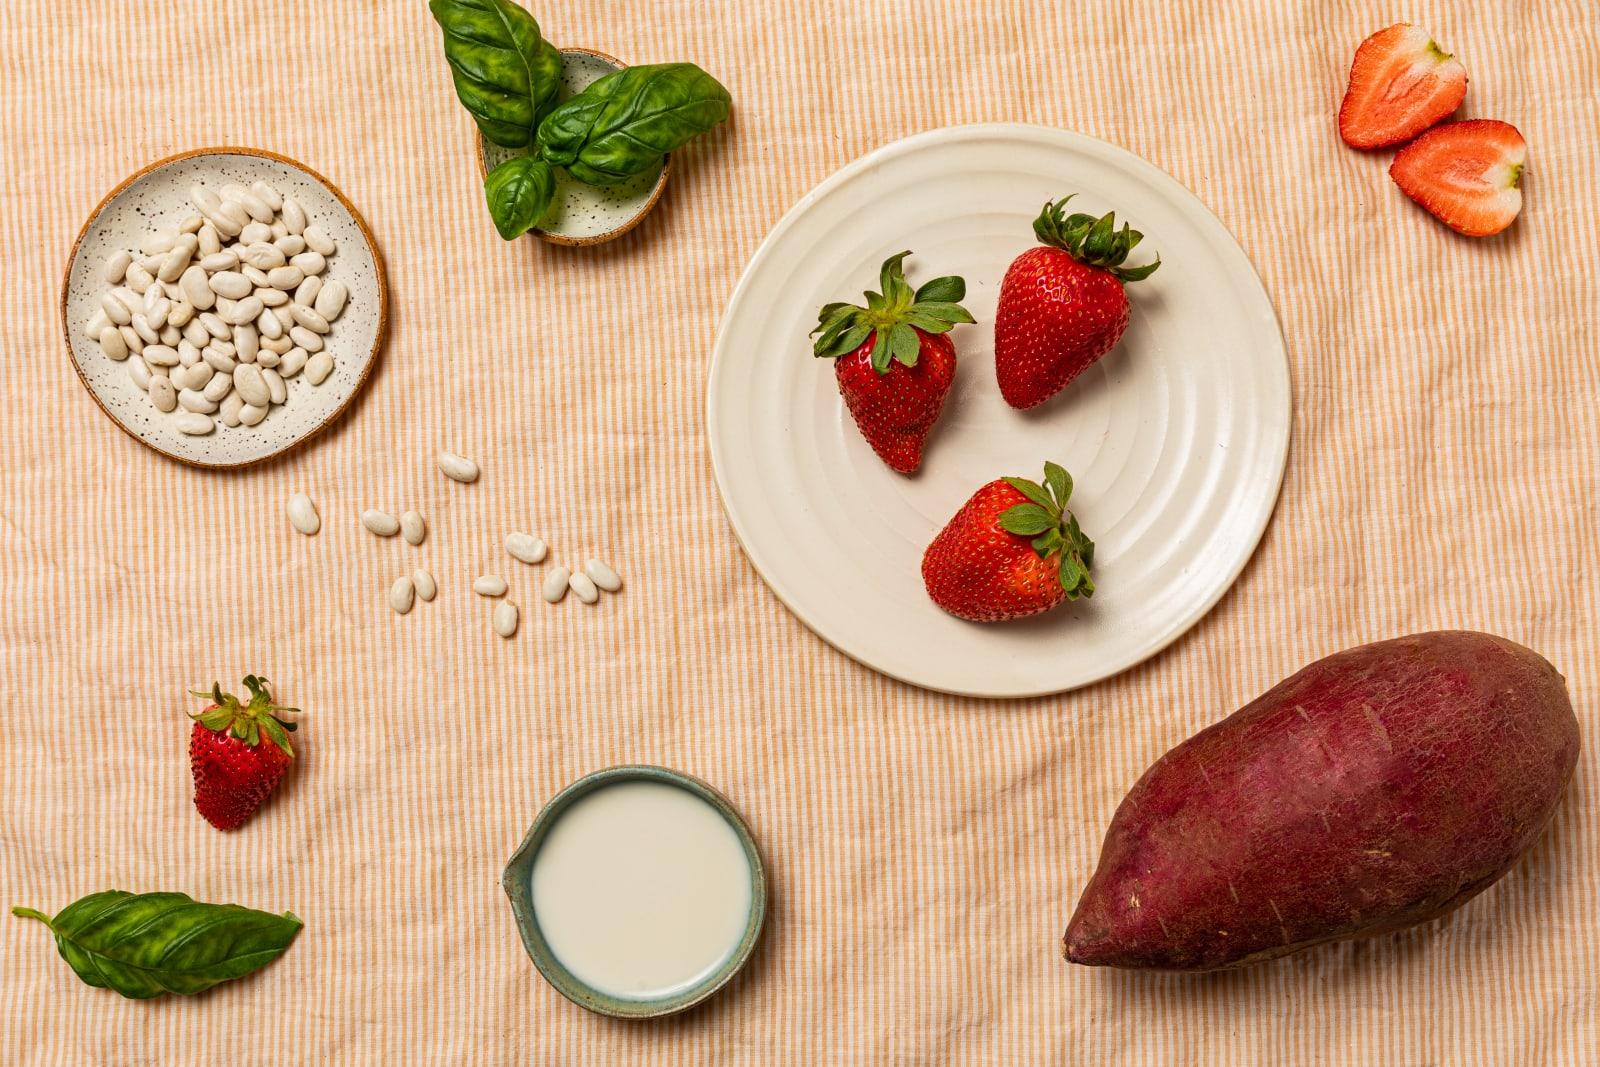 Yumi Strawberry Basil Pie ingredients image